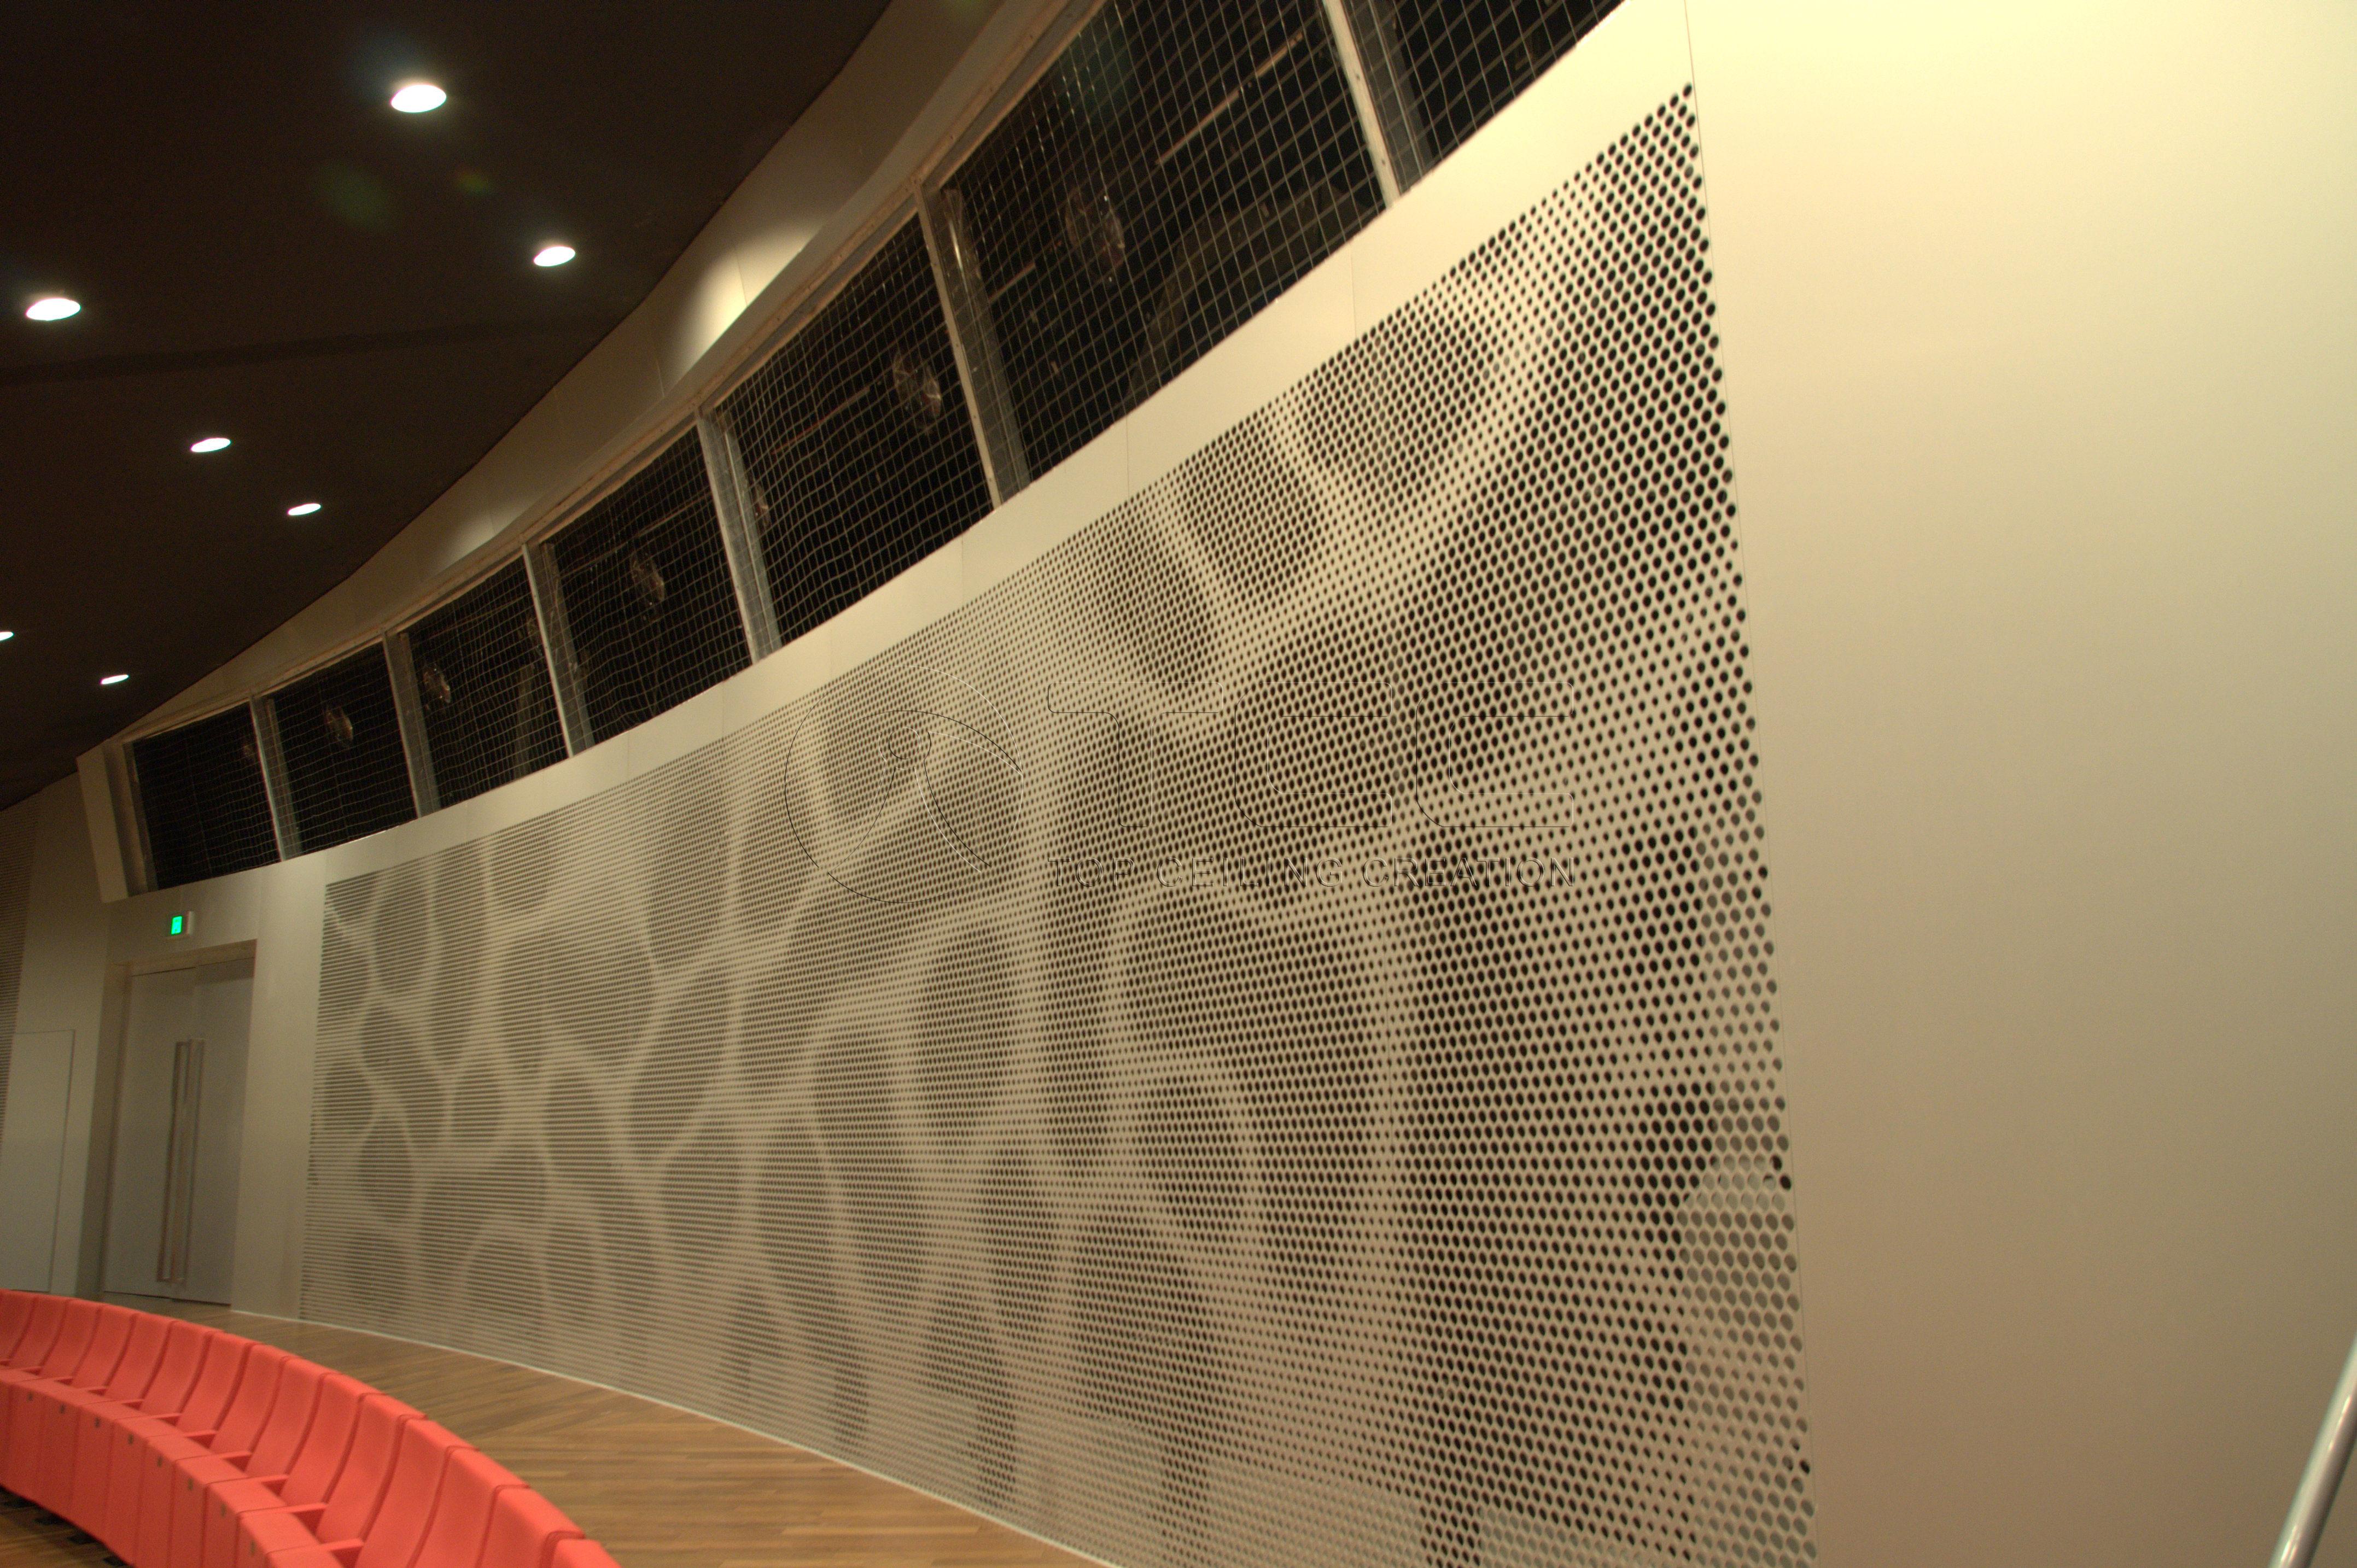 Artistic perforation panel